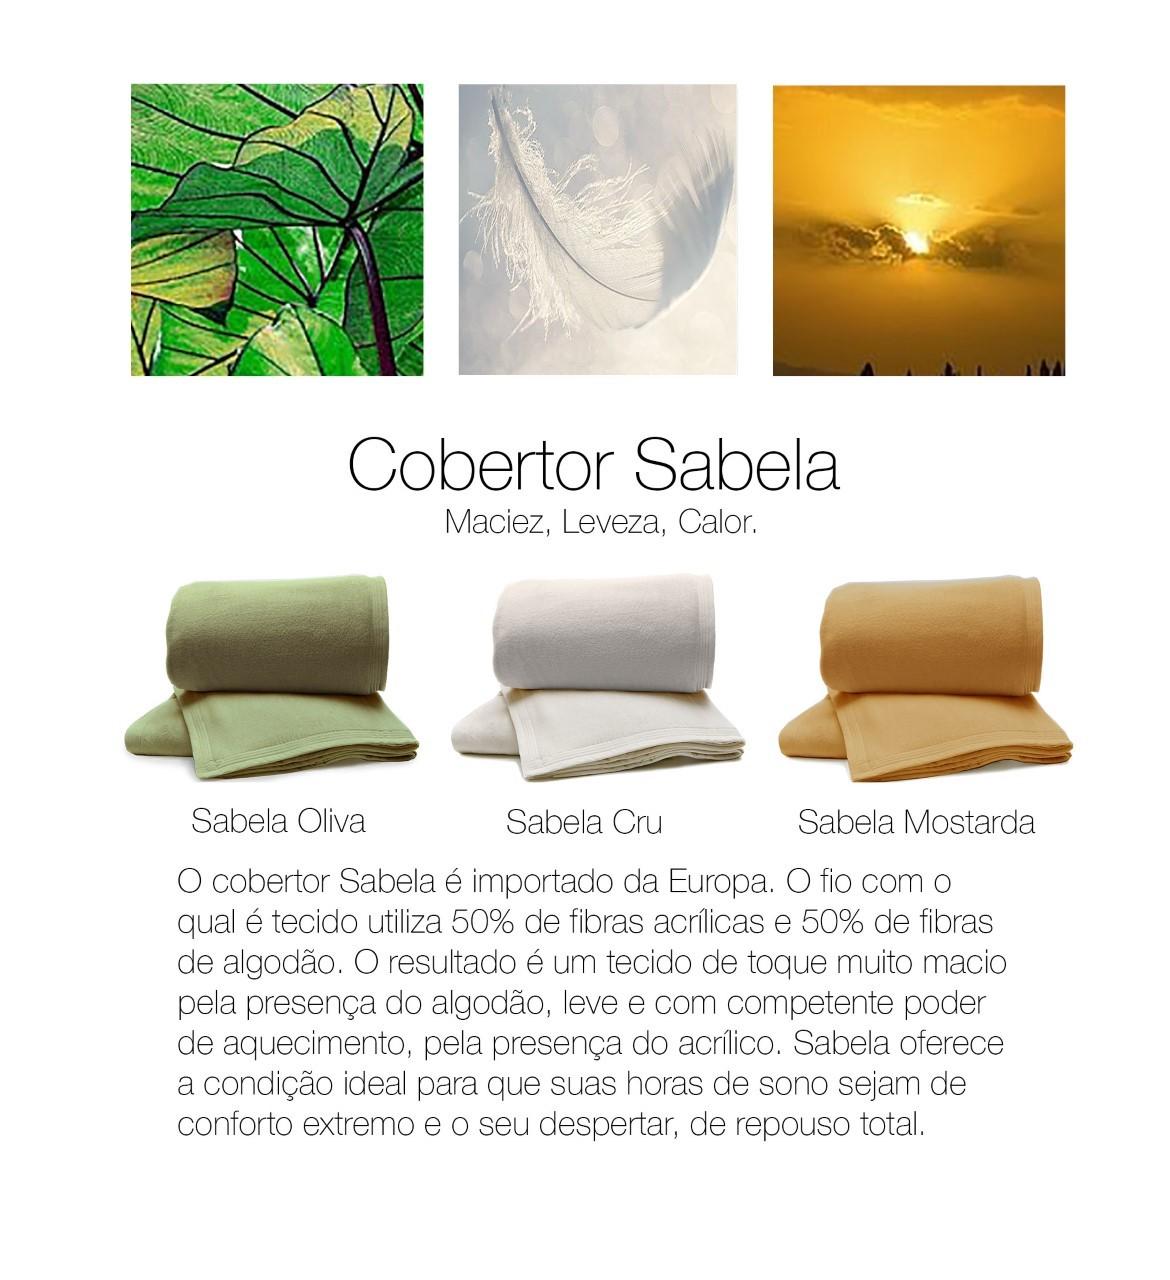 Cobertor-Sabela-comprar-online-tognato